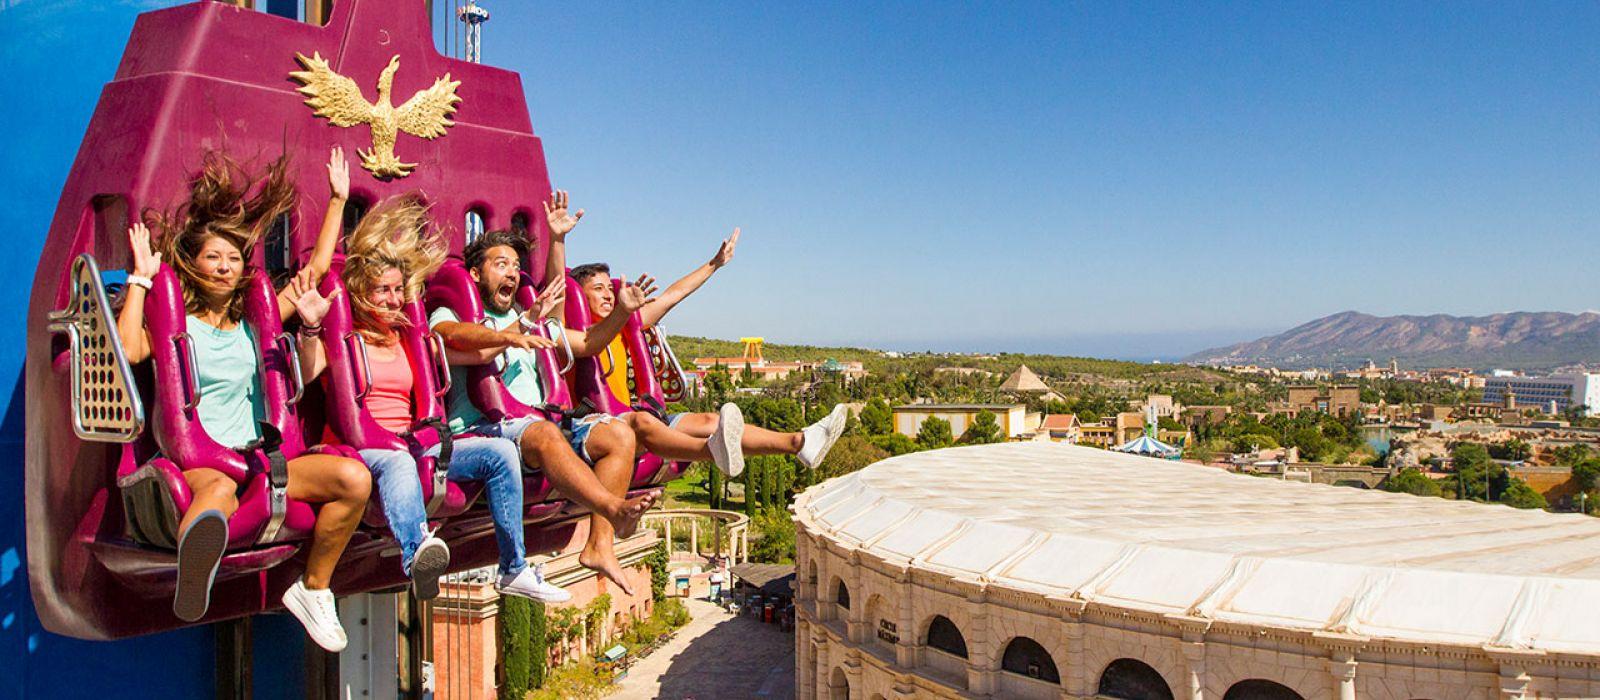 Hôtel Grand Luxor - Terra Mítica® Theme Park à Benidorm en ...